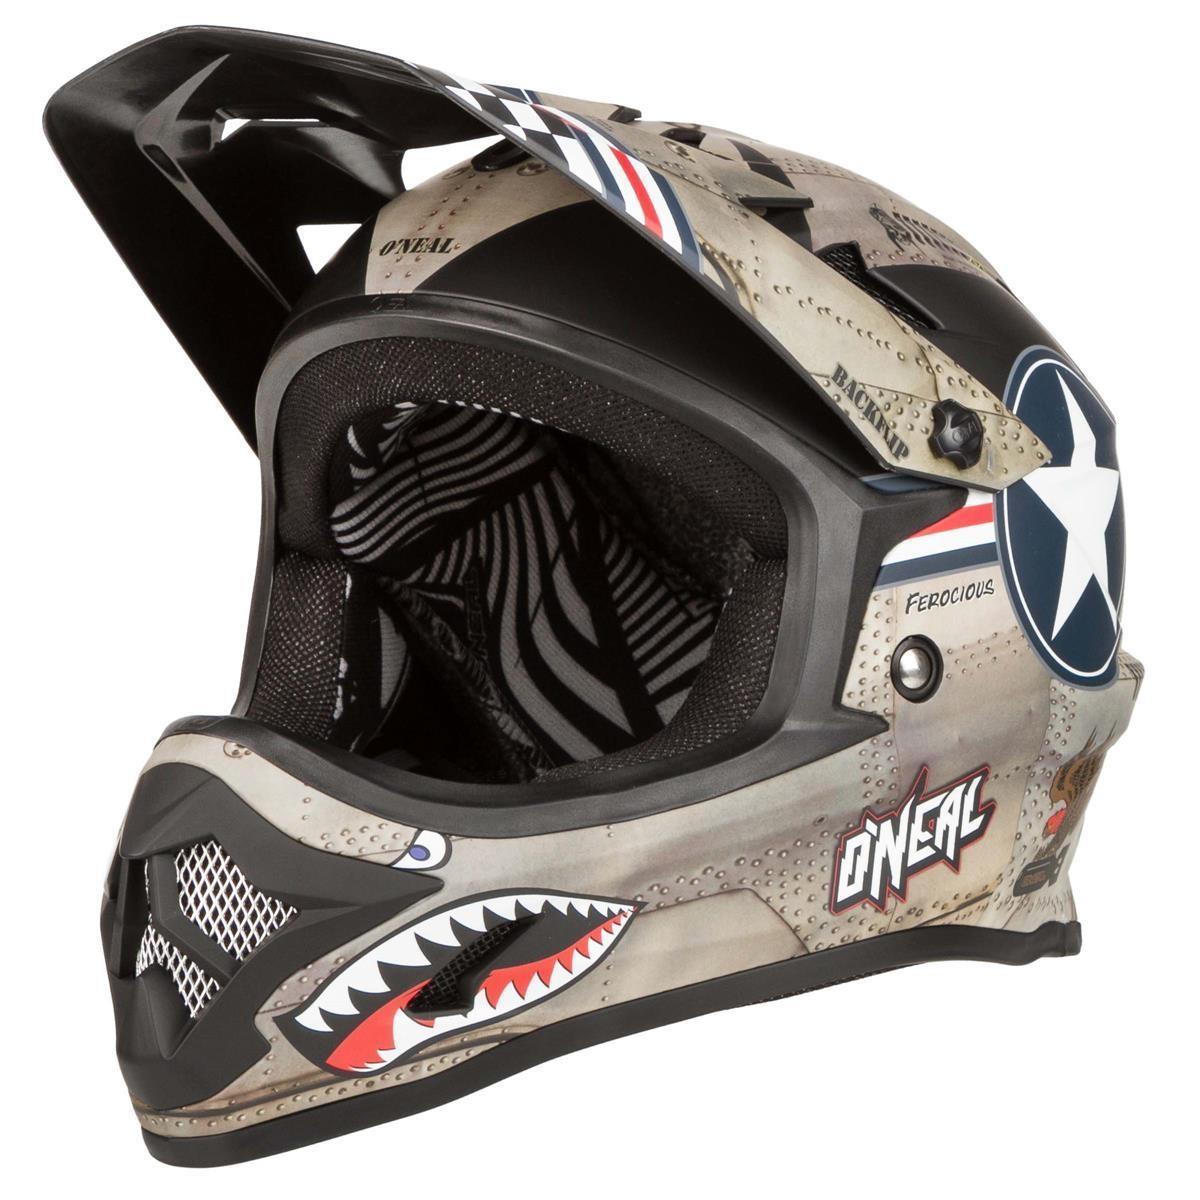 O'Neal Downhill-MTB Helm Backflip Fidlock RL2 Wingman - Metal/Weiß